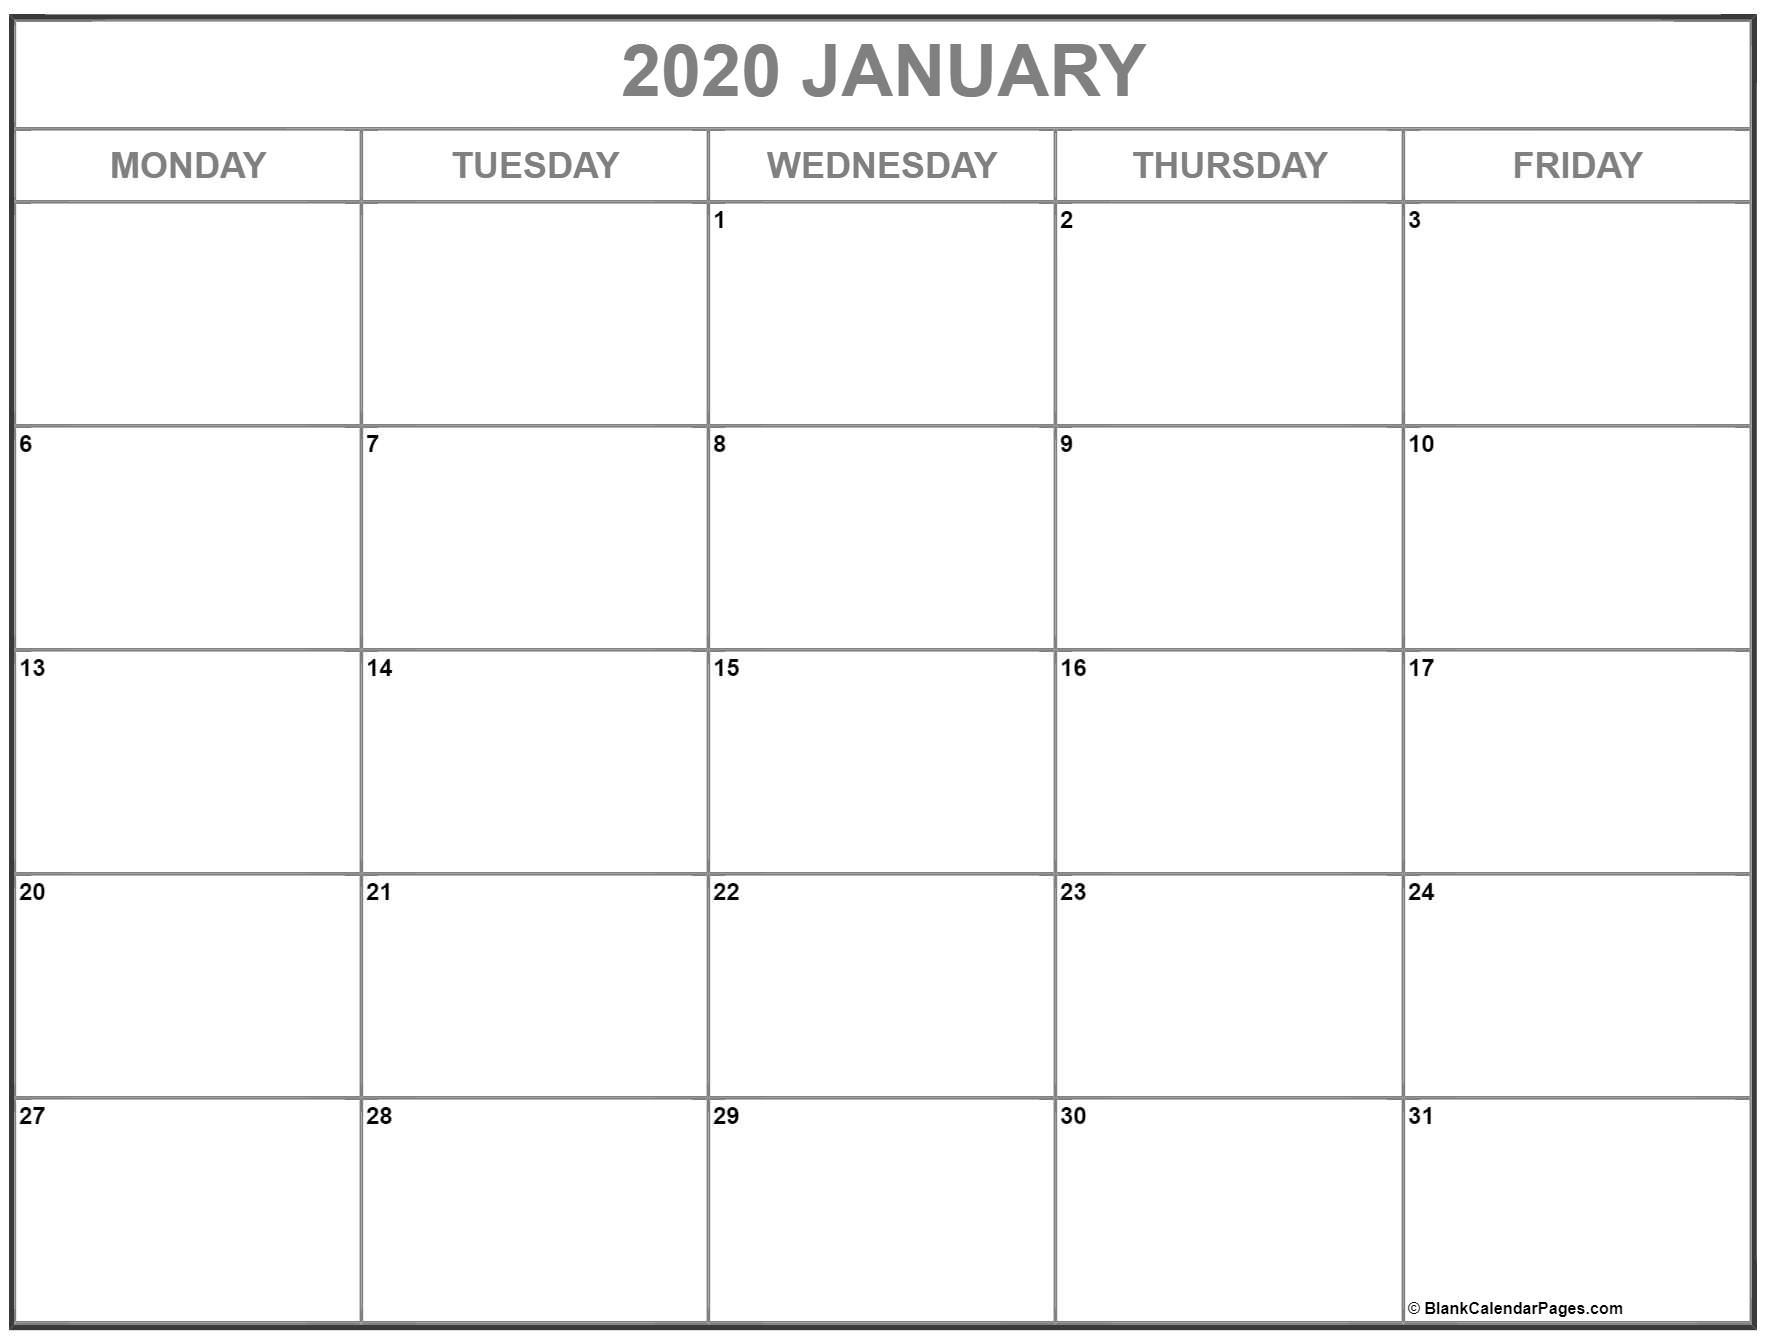 January 2020 Monday Calendar | Monday To Sunday Blank Calendar Monday To Friday